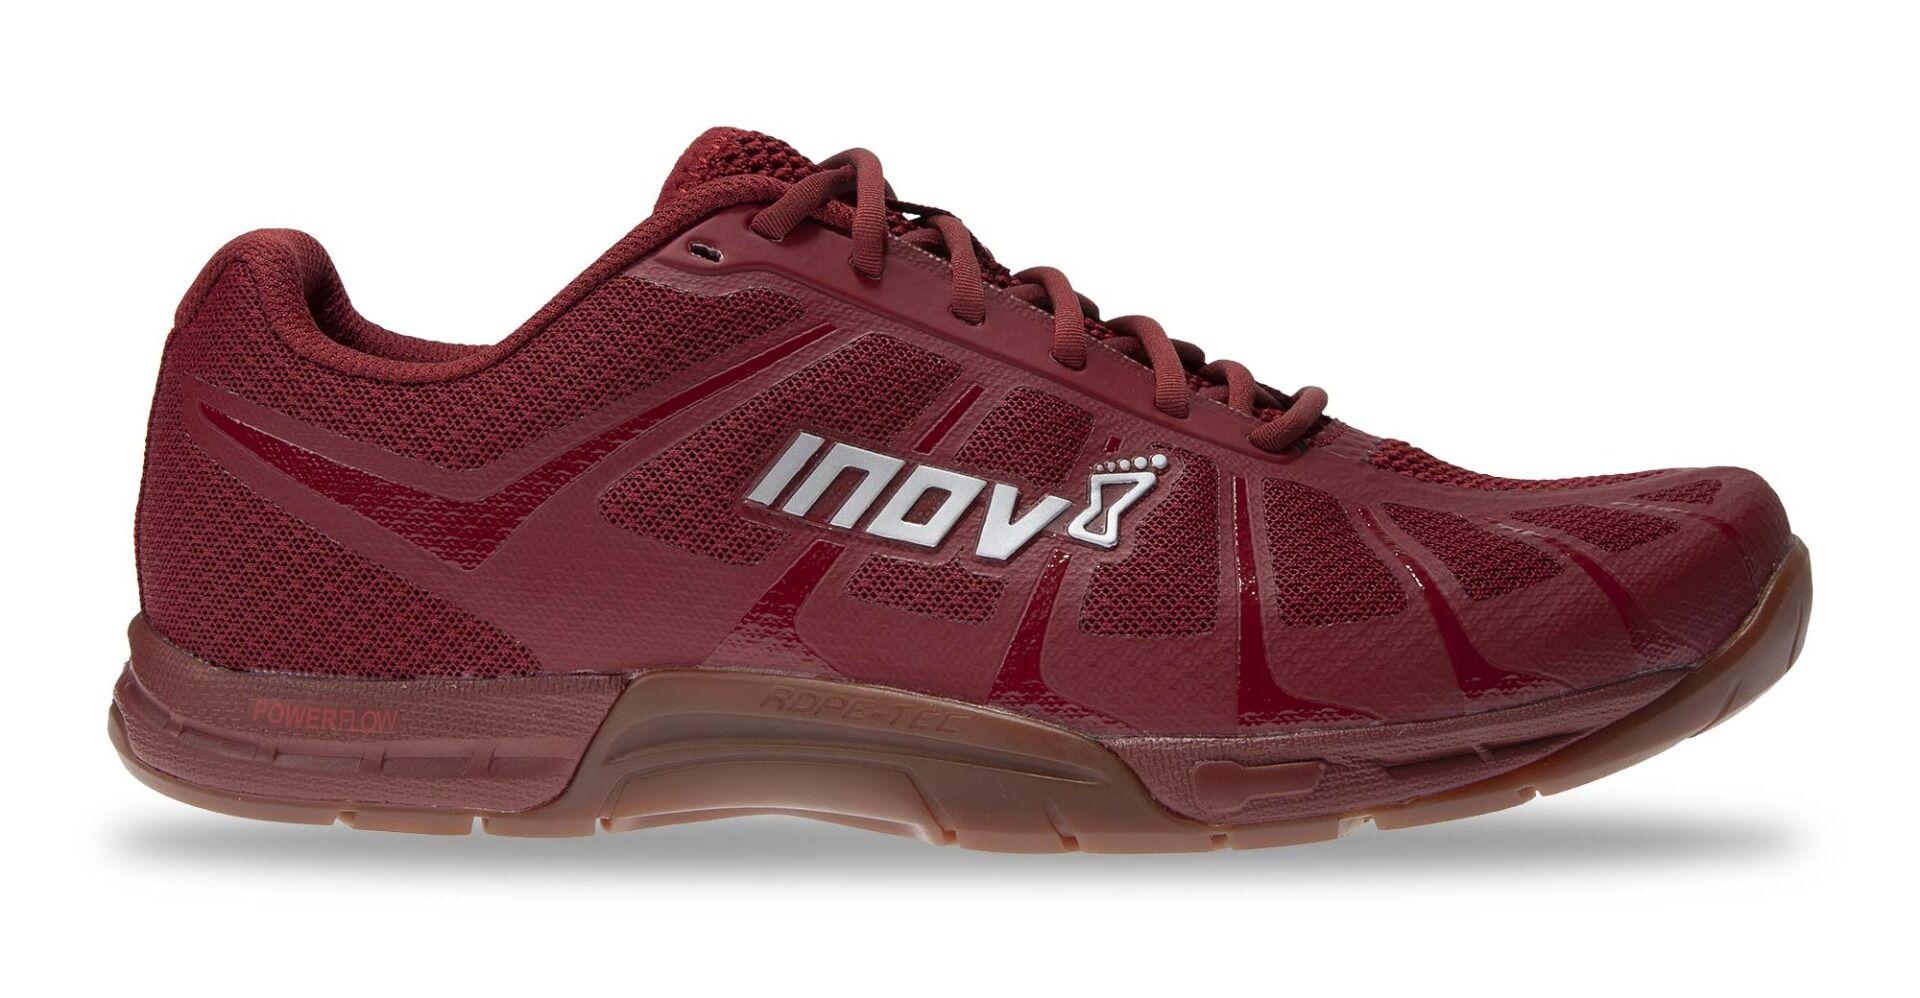 F-Lite 235 V3 Men's Training Shoe | inov-8